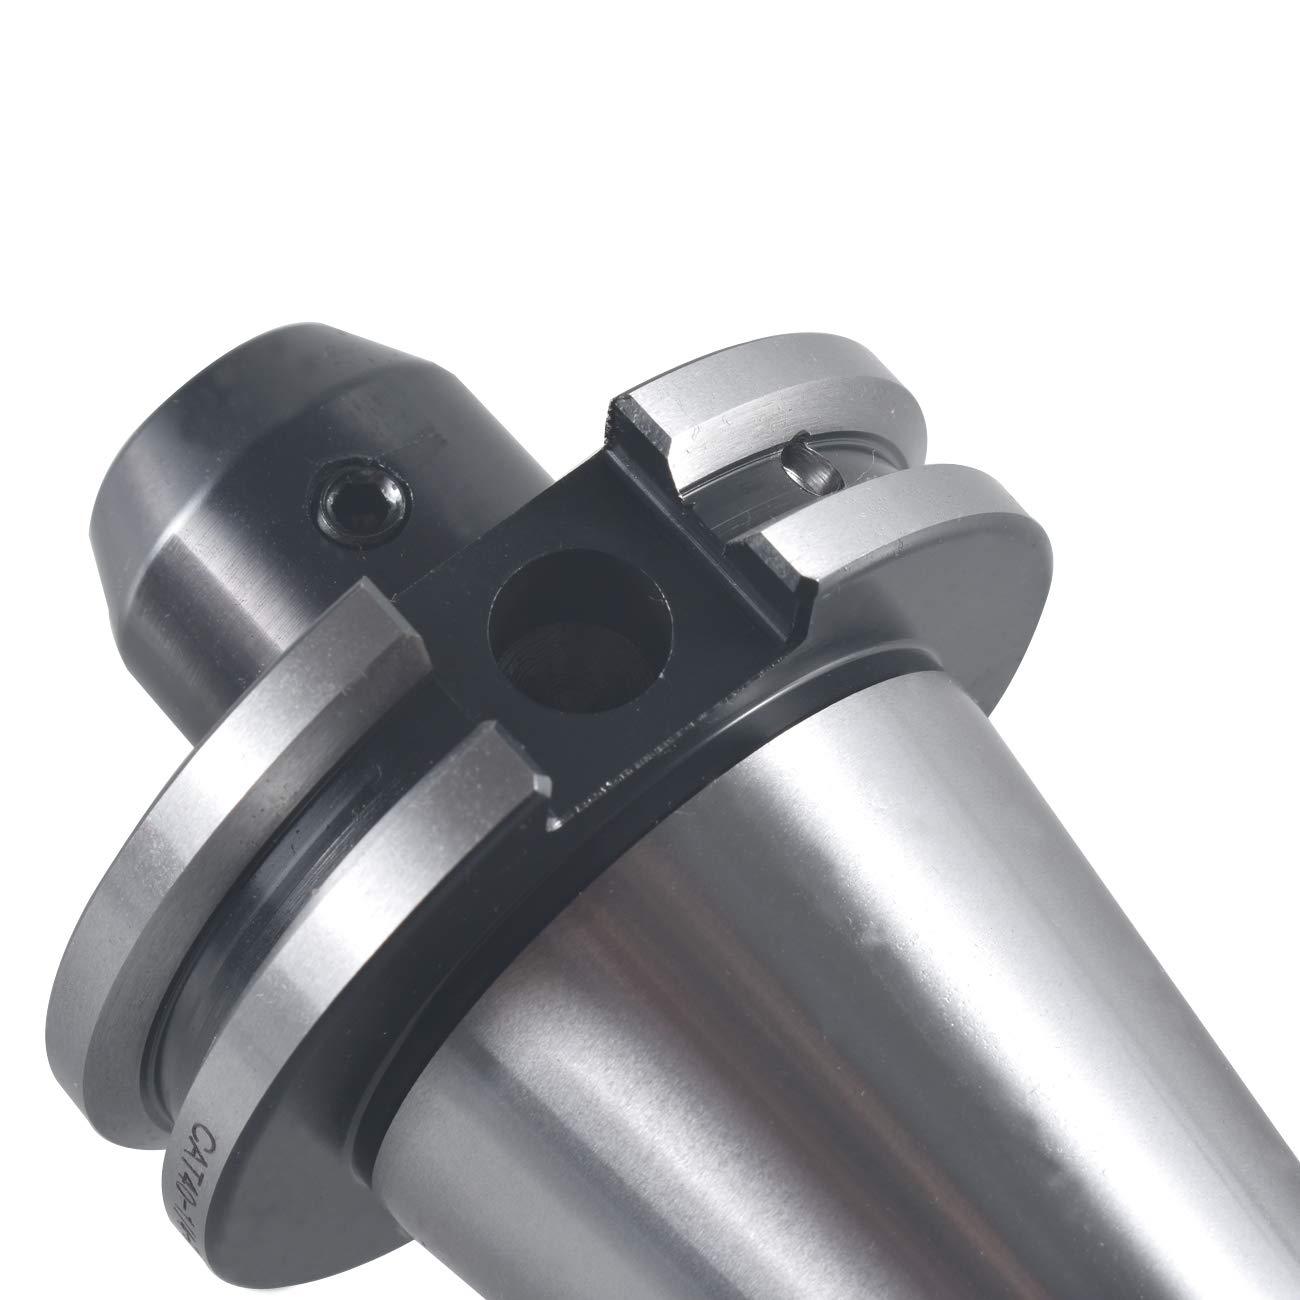 Mingdun CAT 40 1//4 x 1.75 4PCS Set End Mill Tool Holder Balanced G2.5 20000RPM CAT40 US